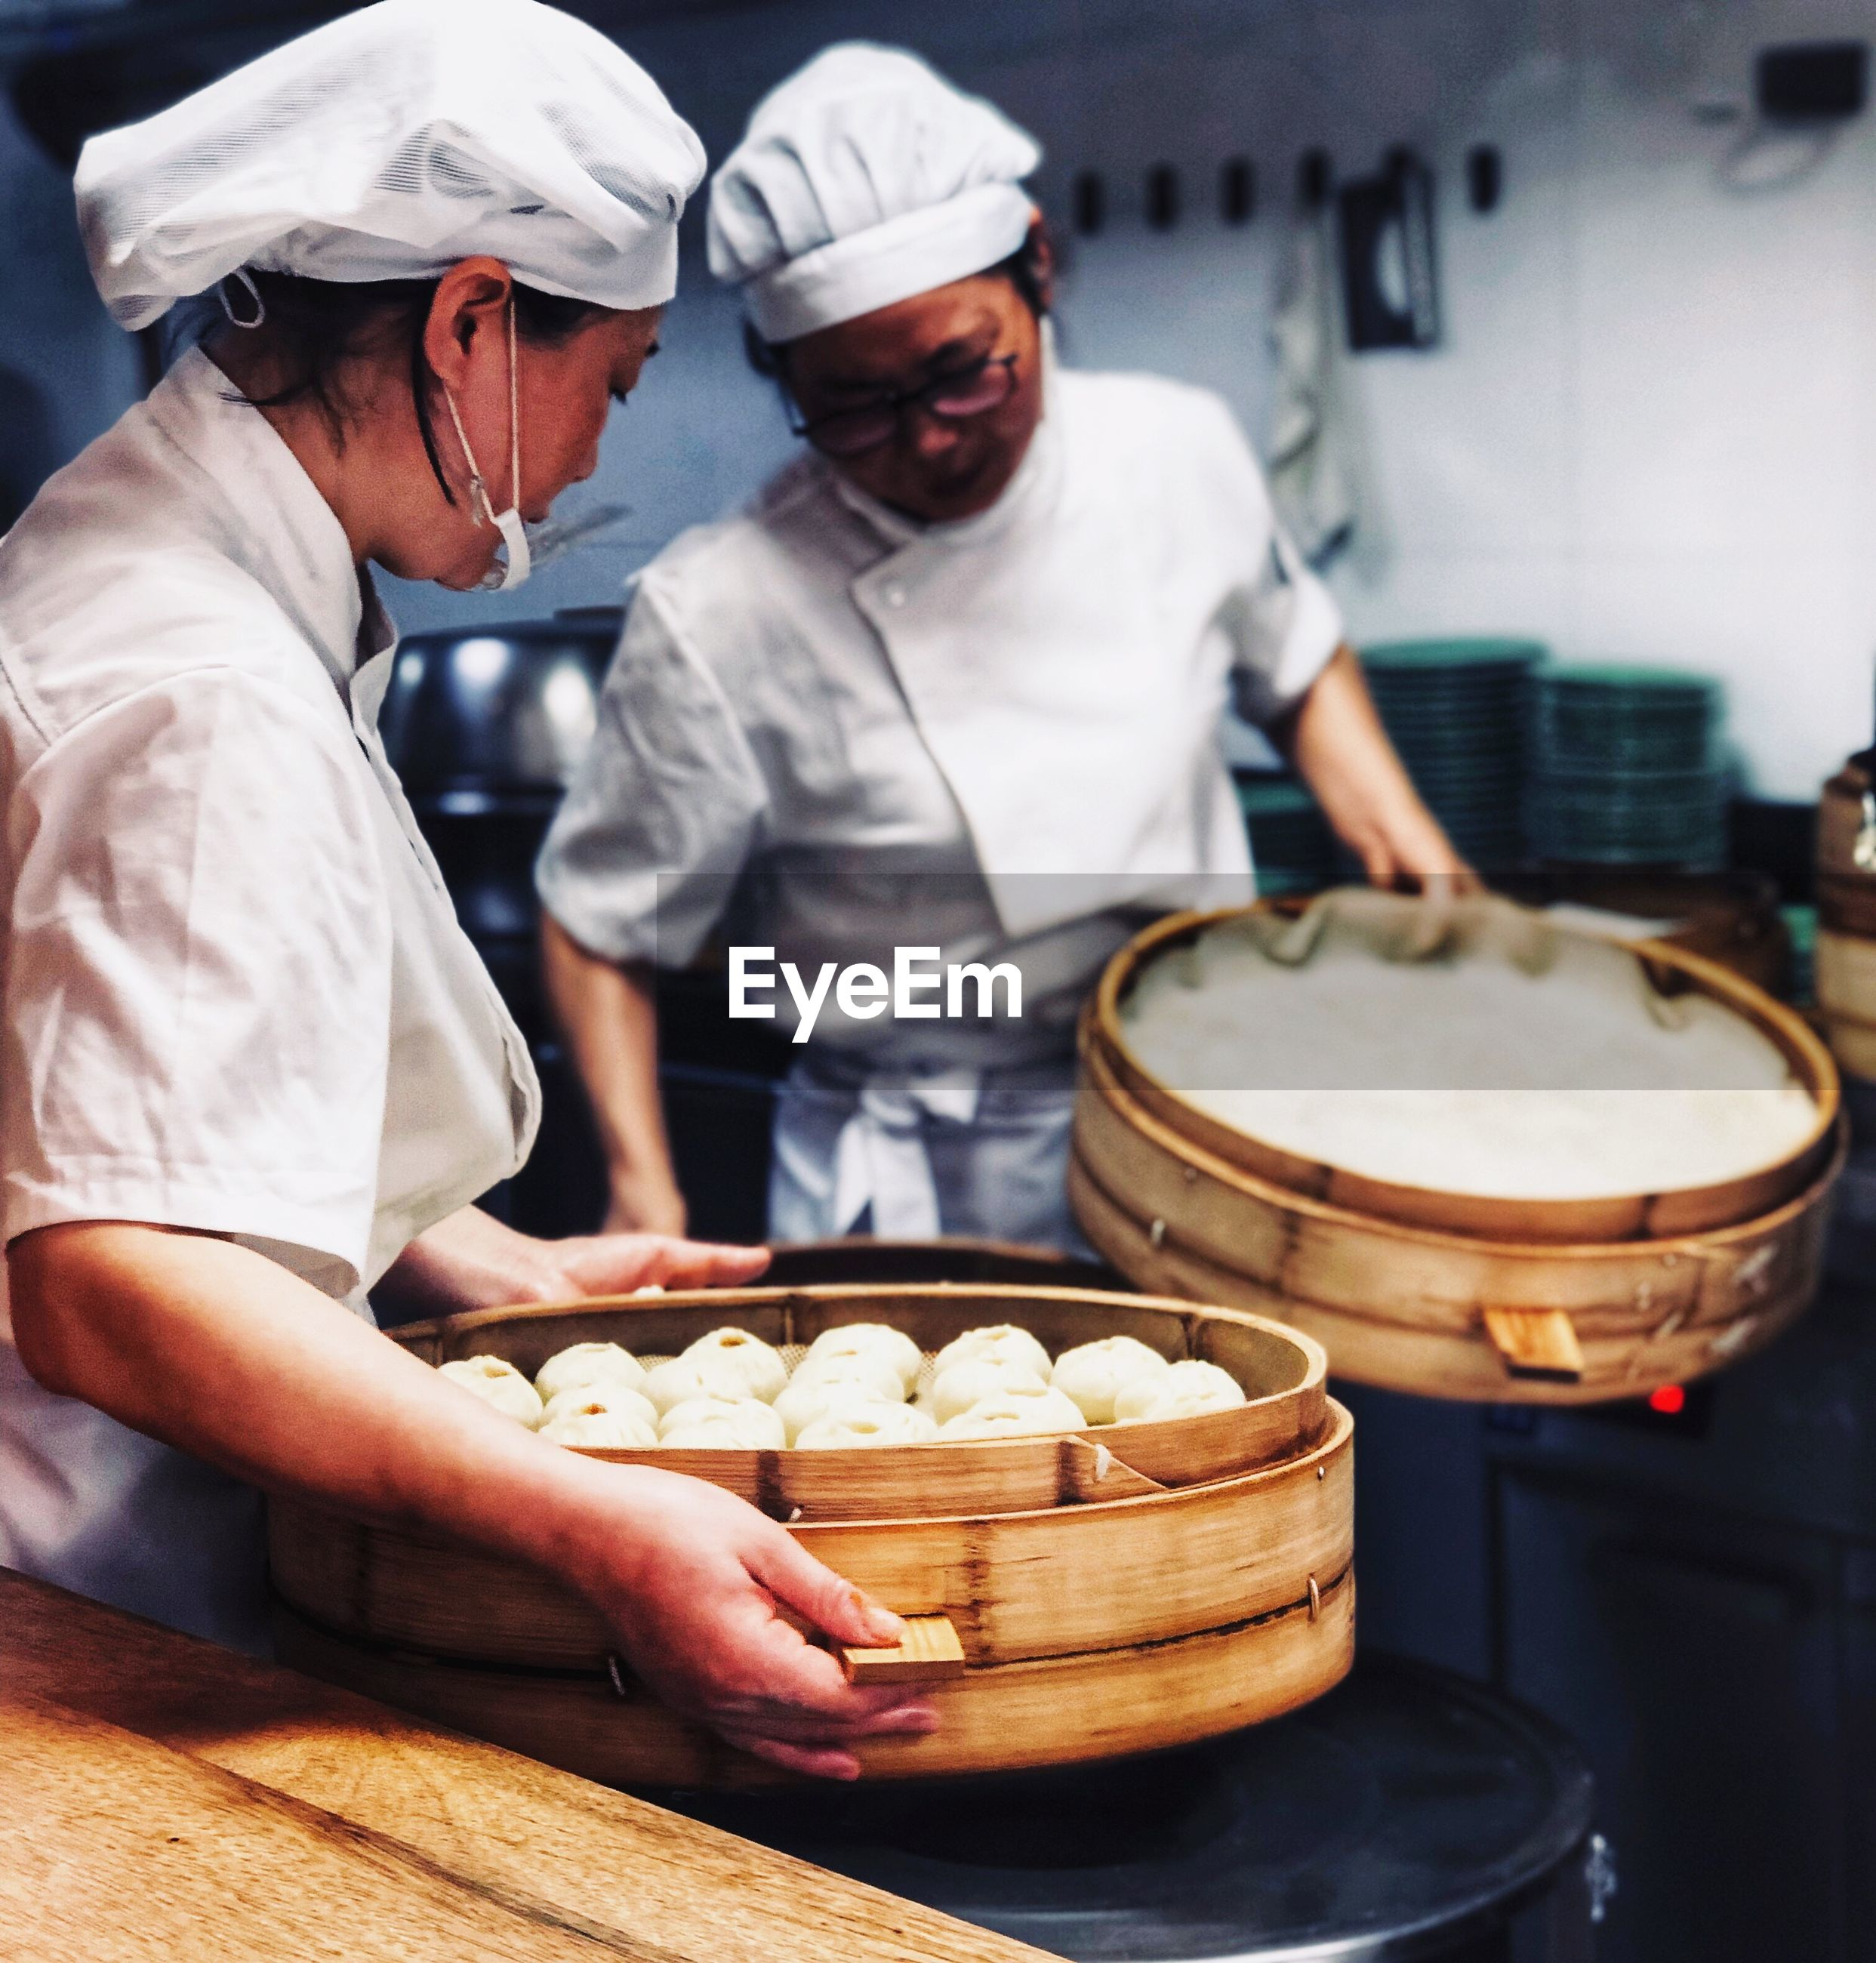 Chefs preparing dumplings in kitchen